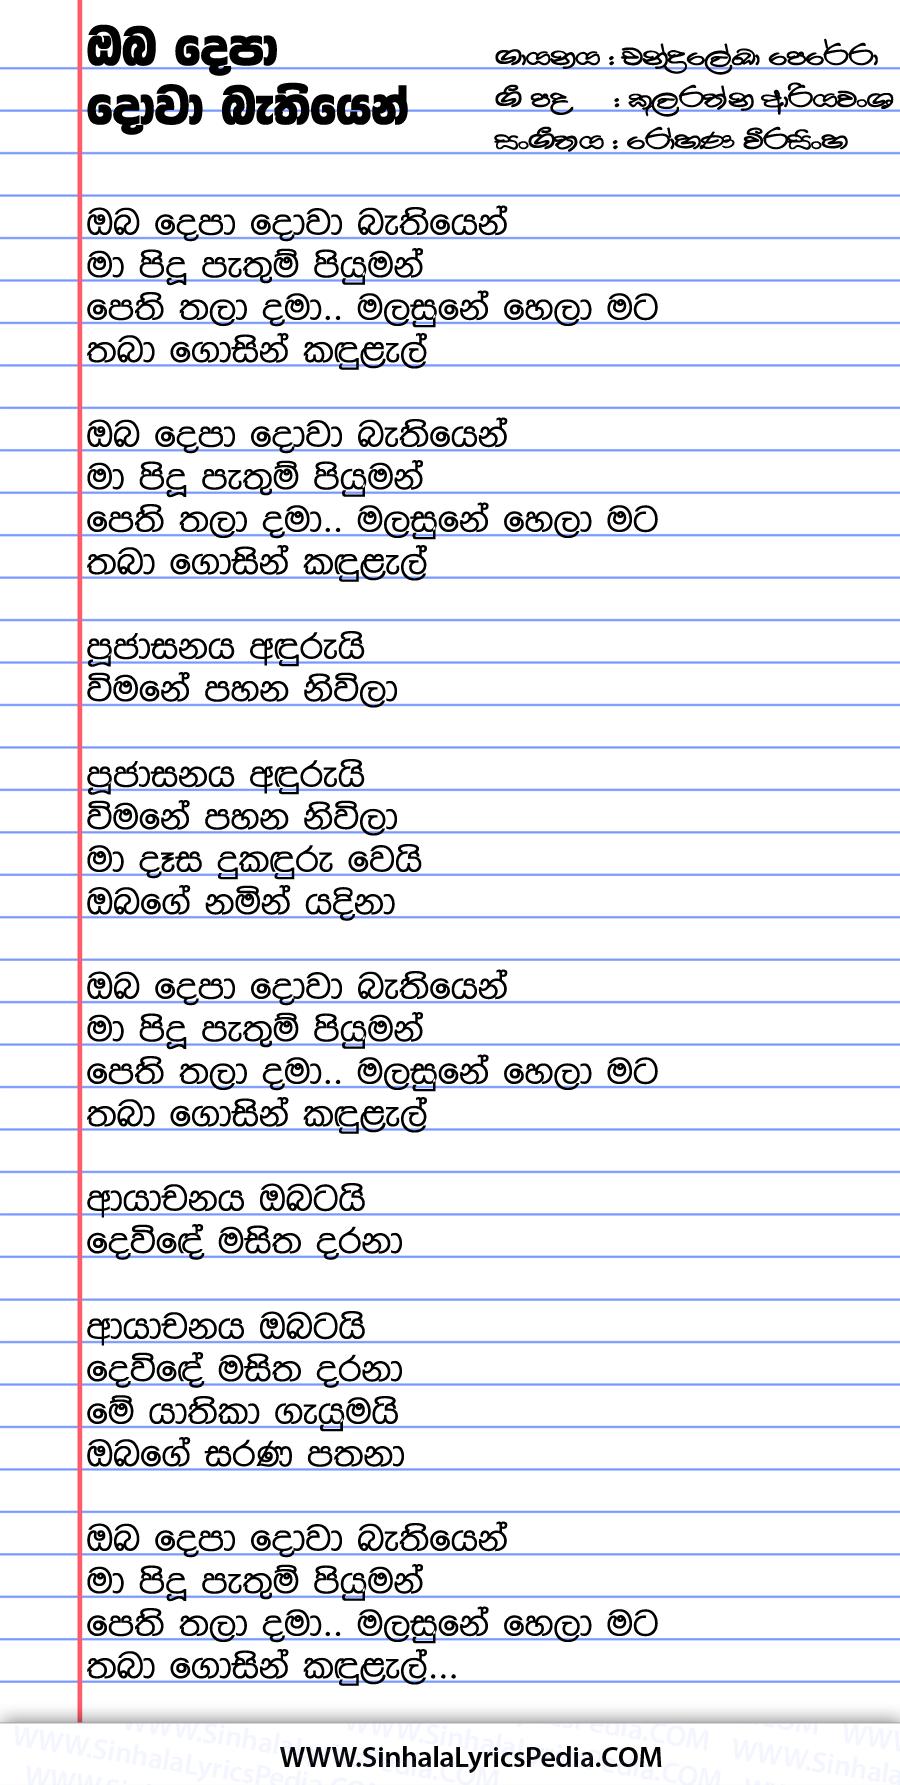 Obe Depa Dowa Bathiyen Song Lyrics